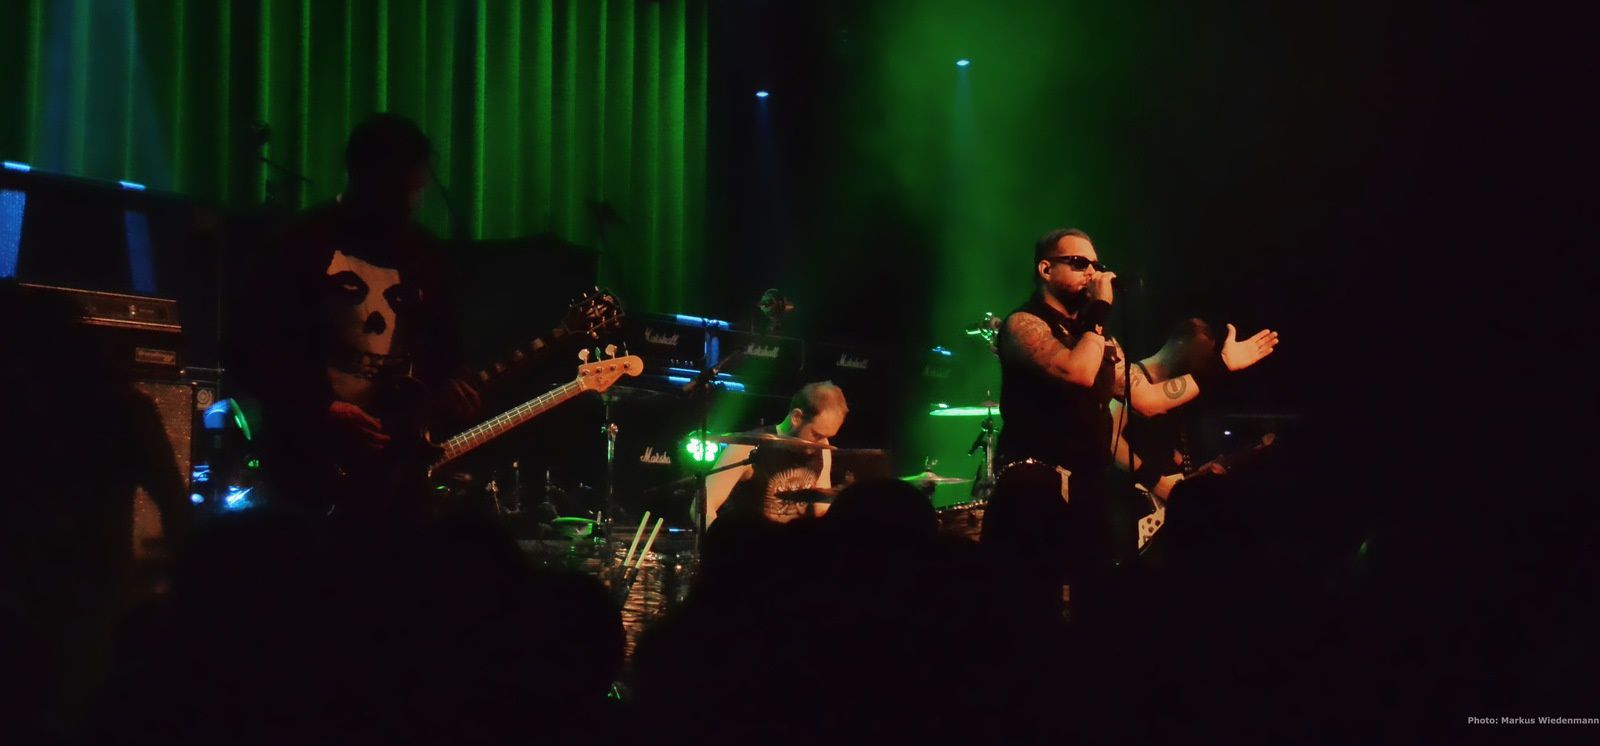 Live review ACE FREHLEY / DIABLO BLVD, Zoetermeer, 11.06.2015